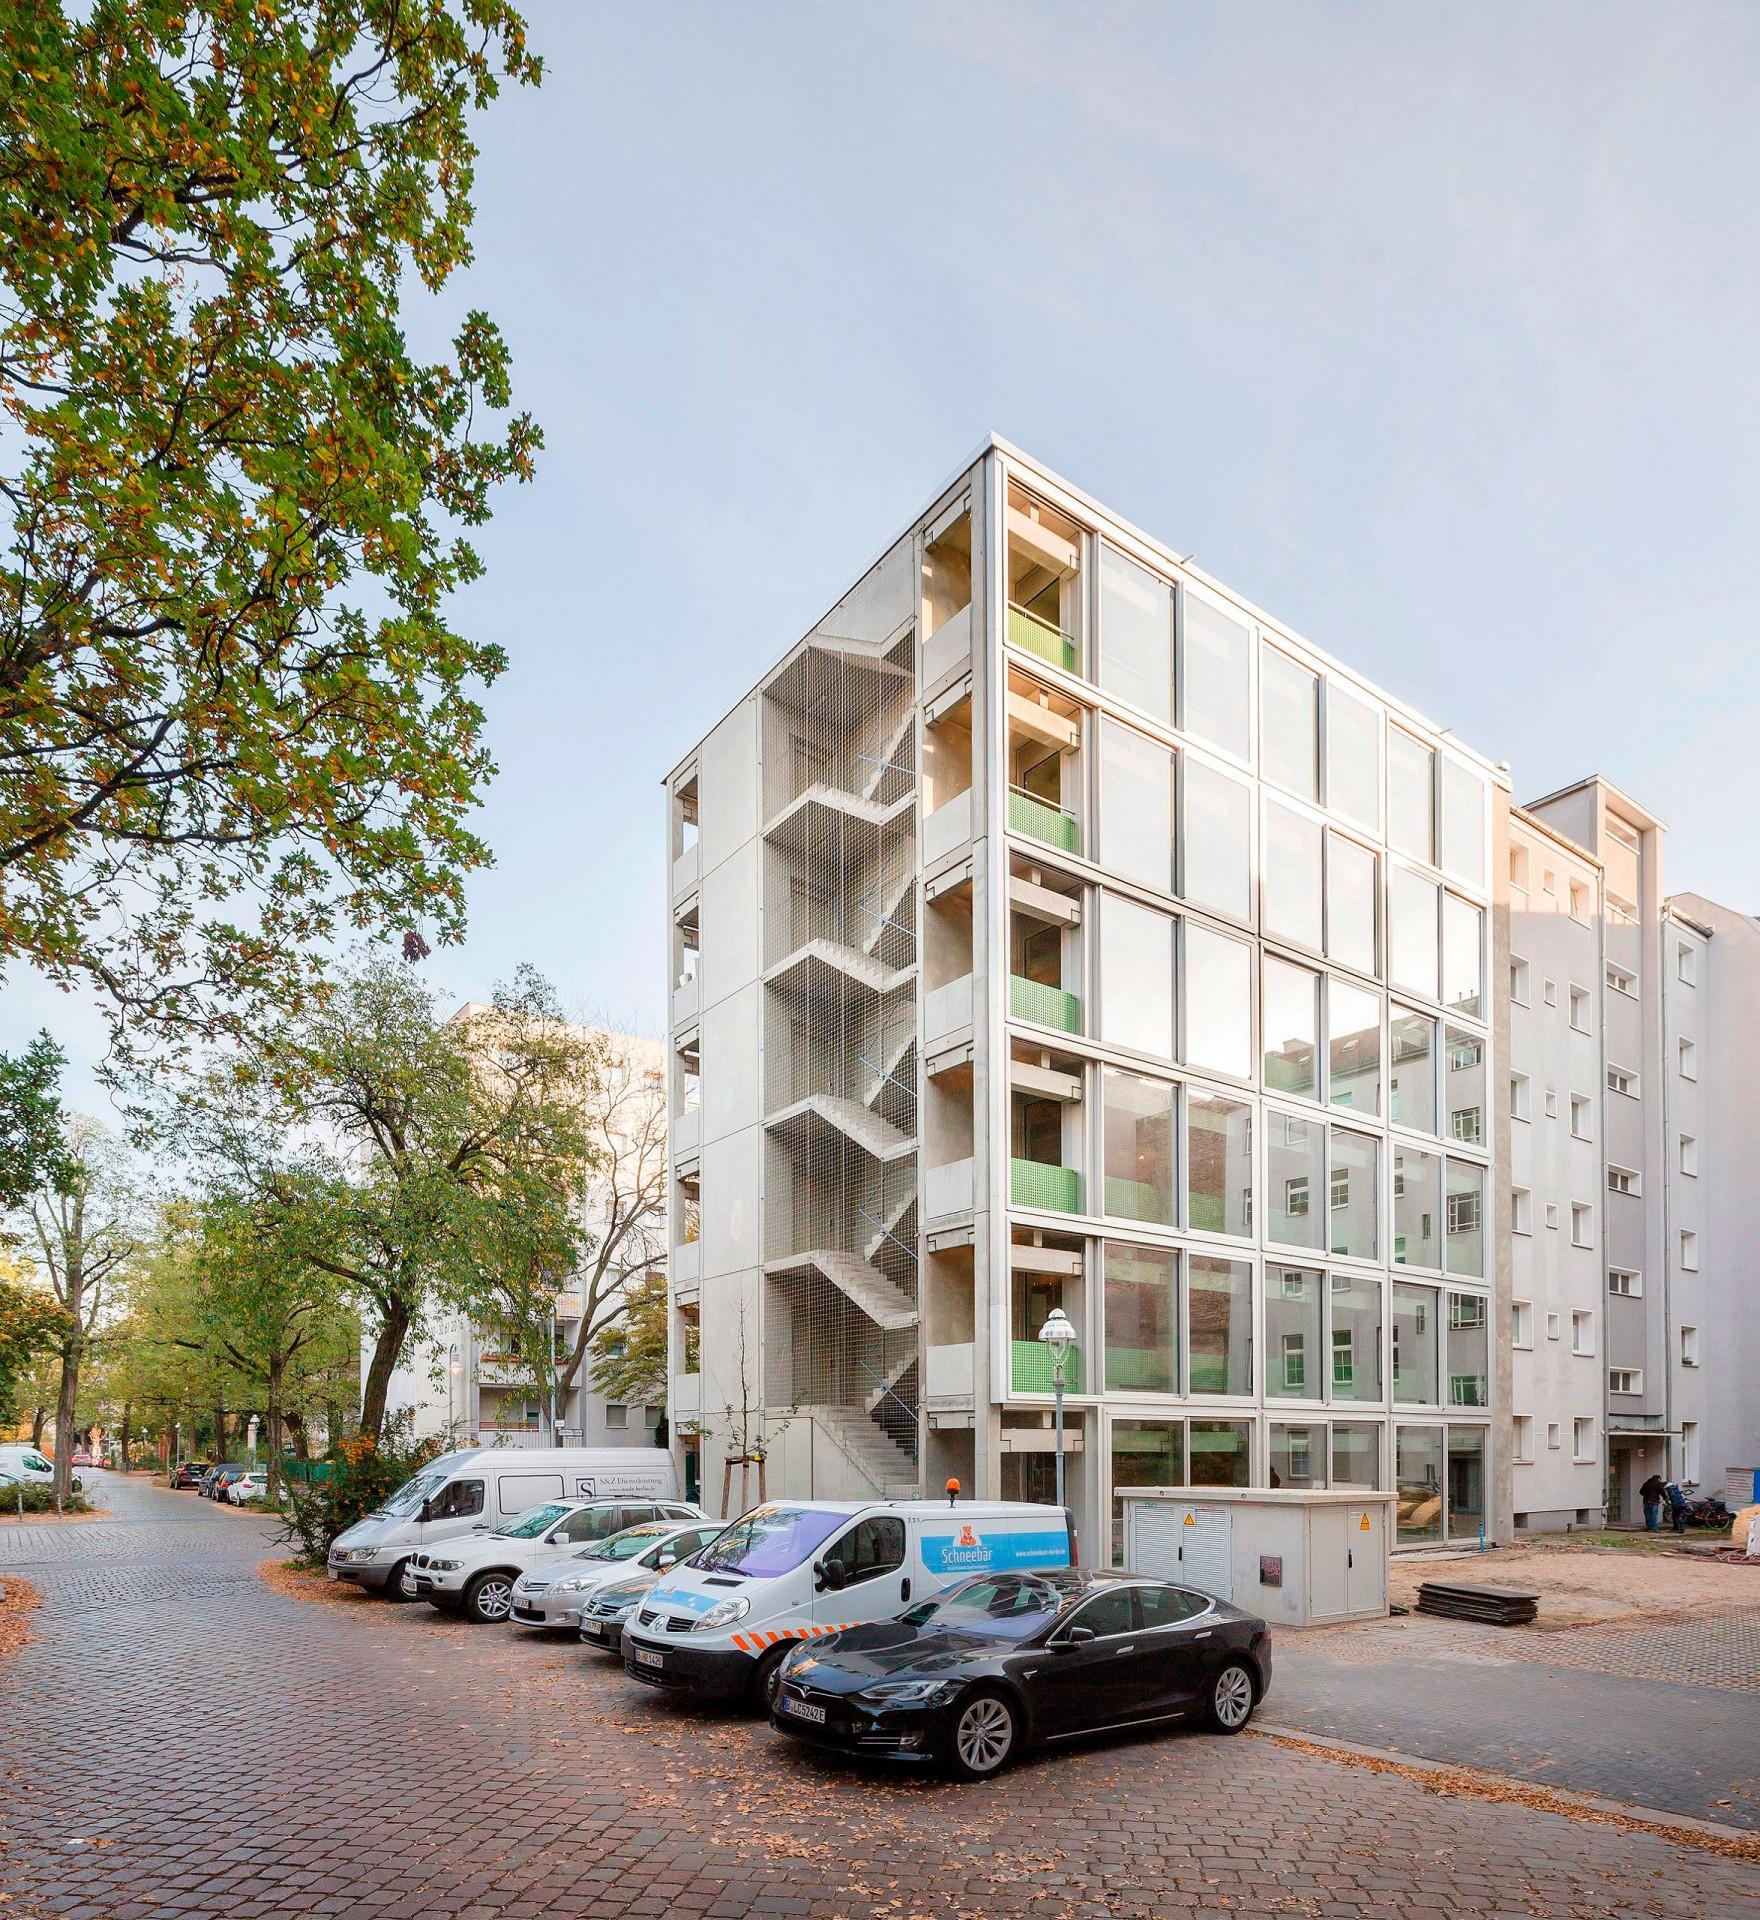 Fachada do Wohnregal: edifício comporta tanto unidades habitacionais quanto escritórios Crédito: FAR